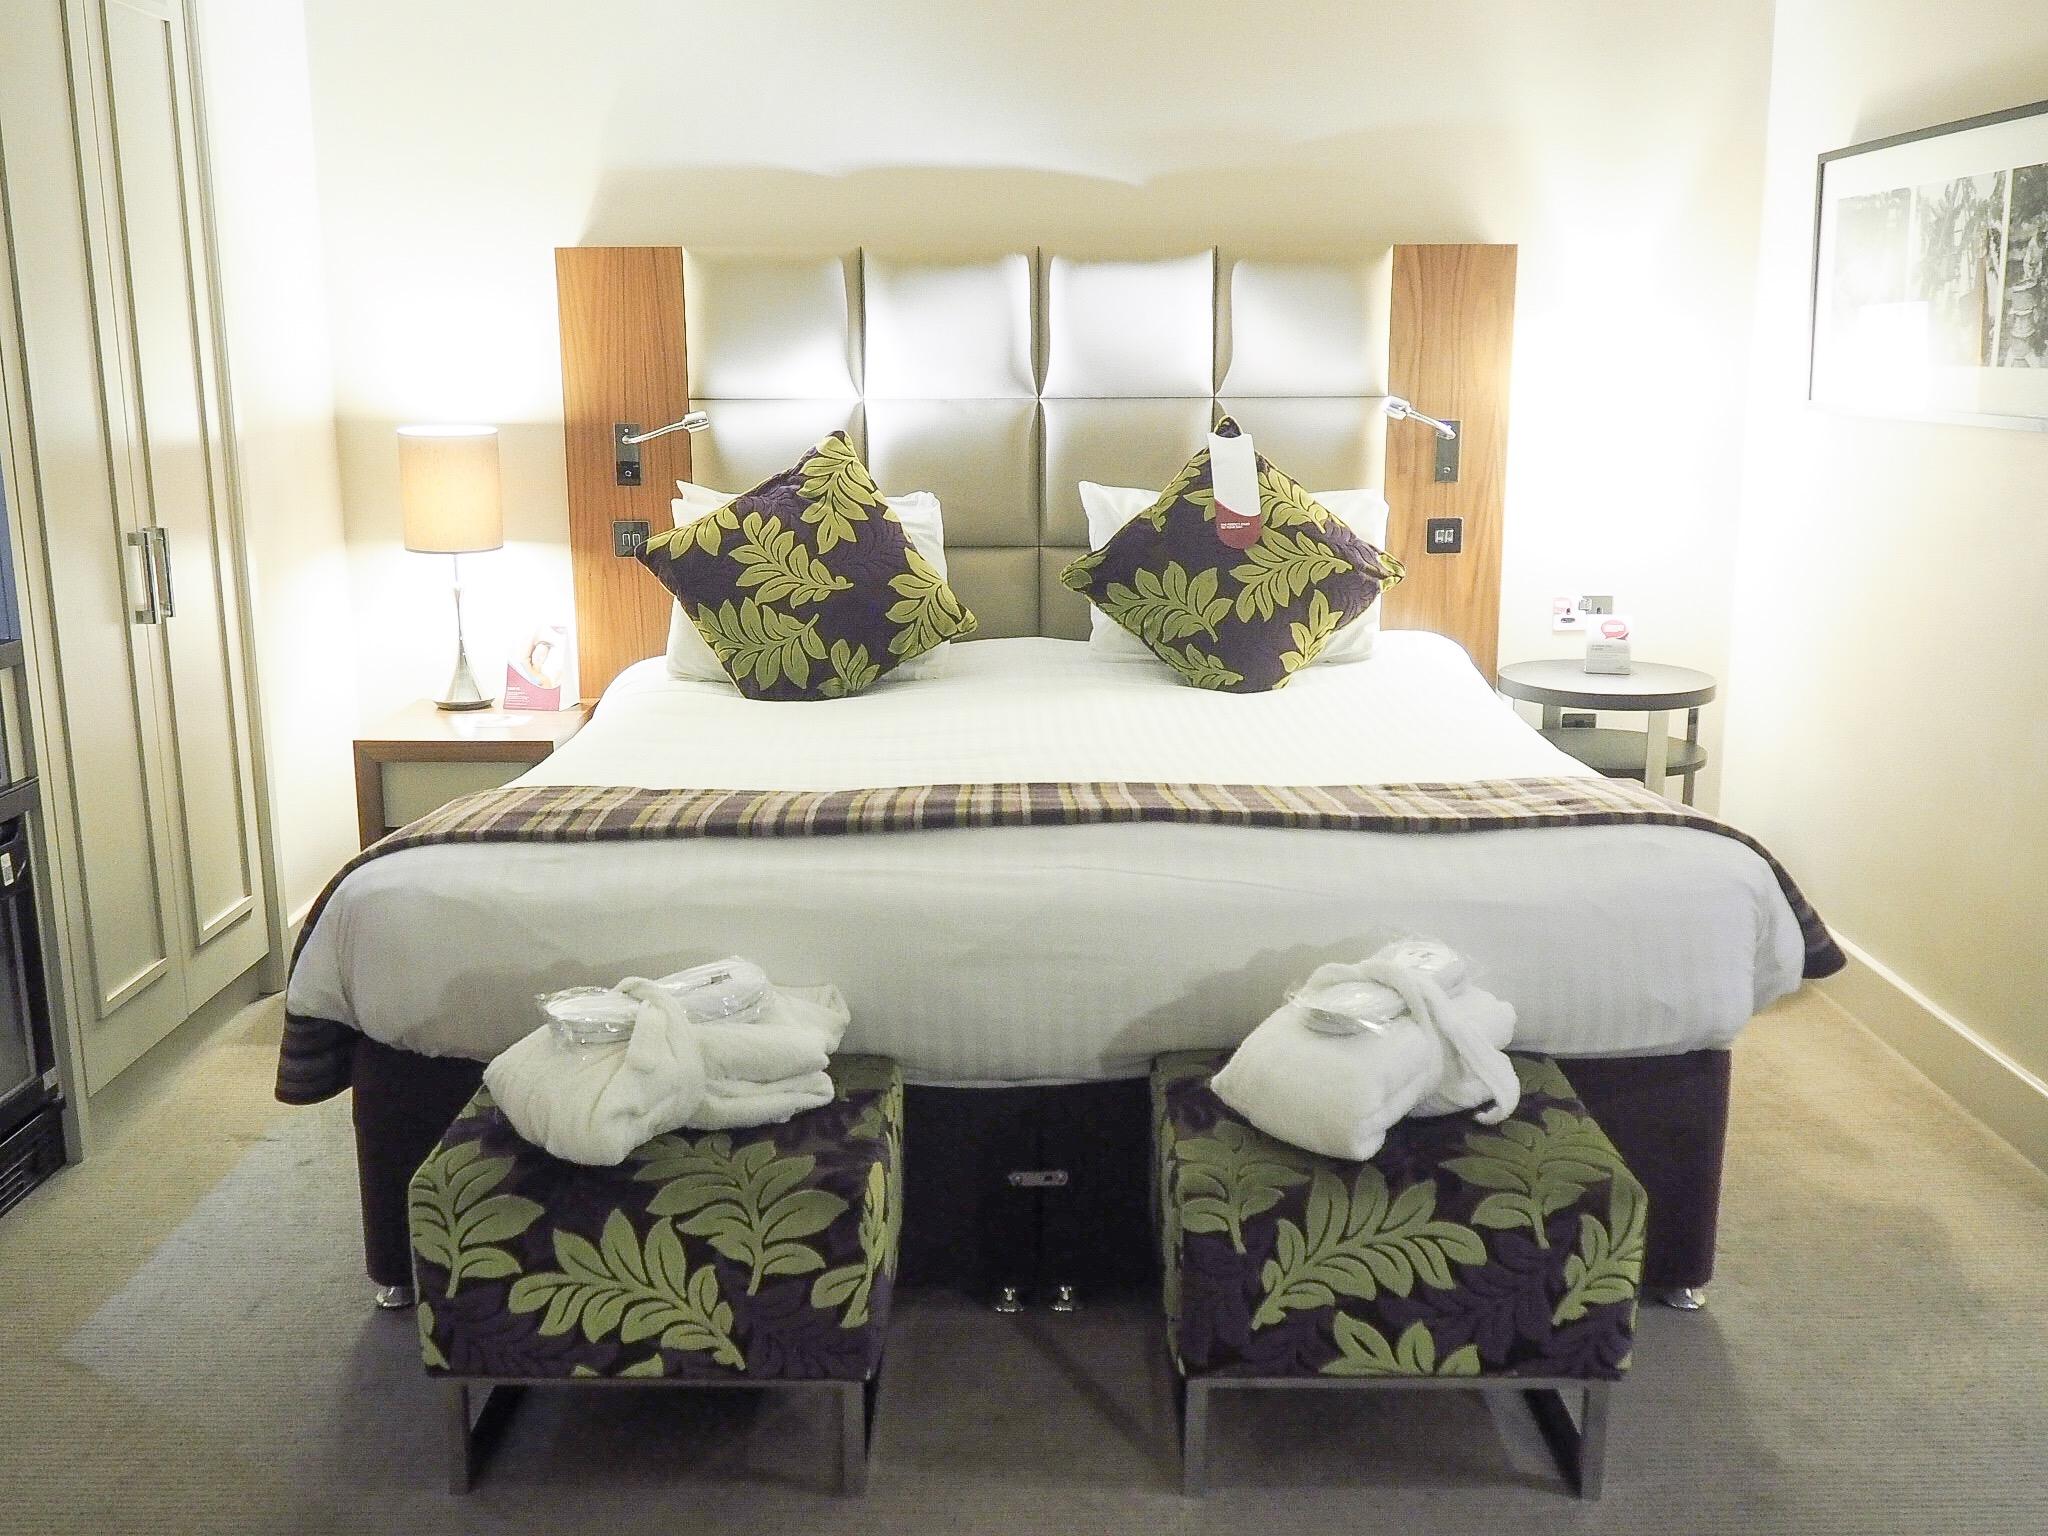 Crowne Plaza Resort Colchester king size bed